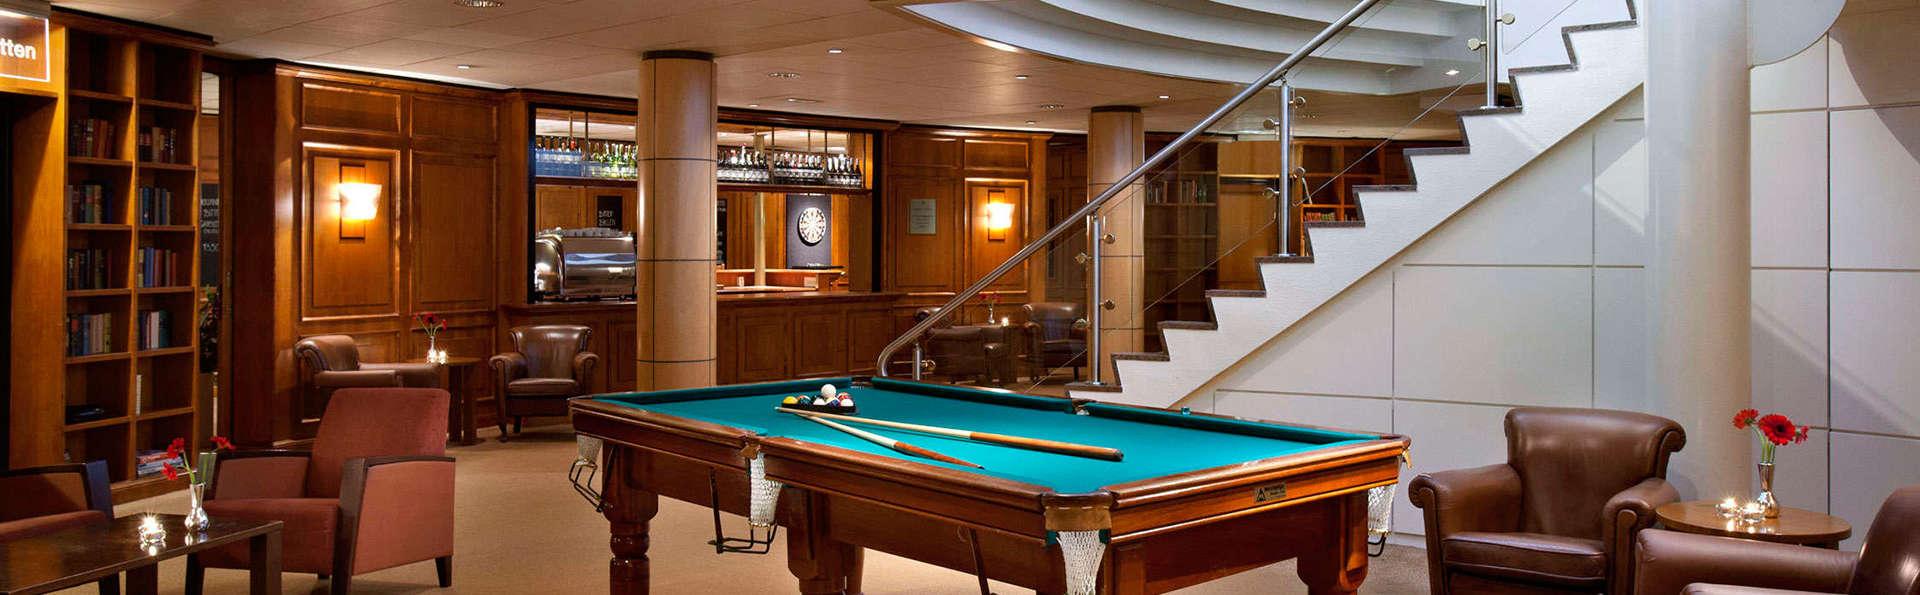 Hotel Hilton Royal Parc Soestduinen, charmehotel Soestduinen